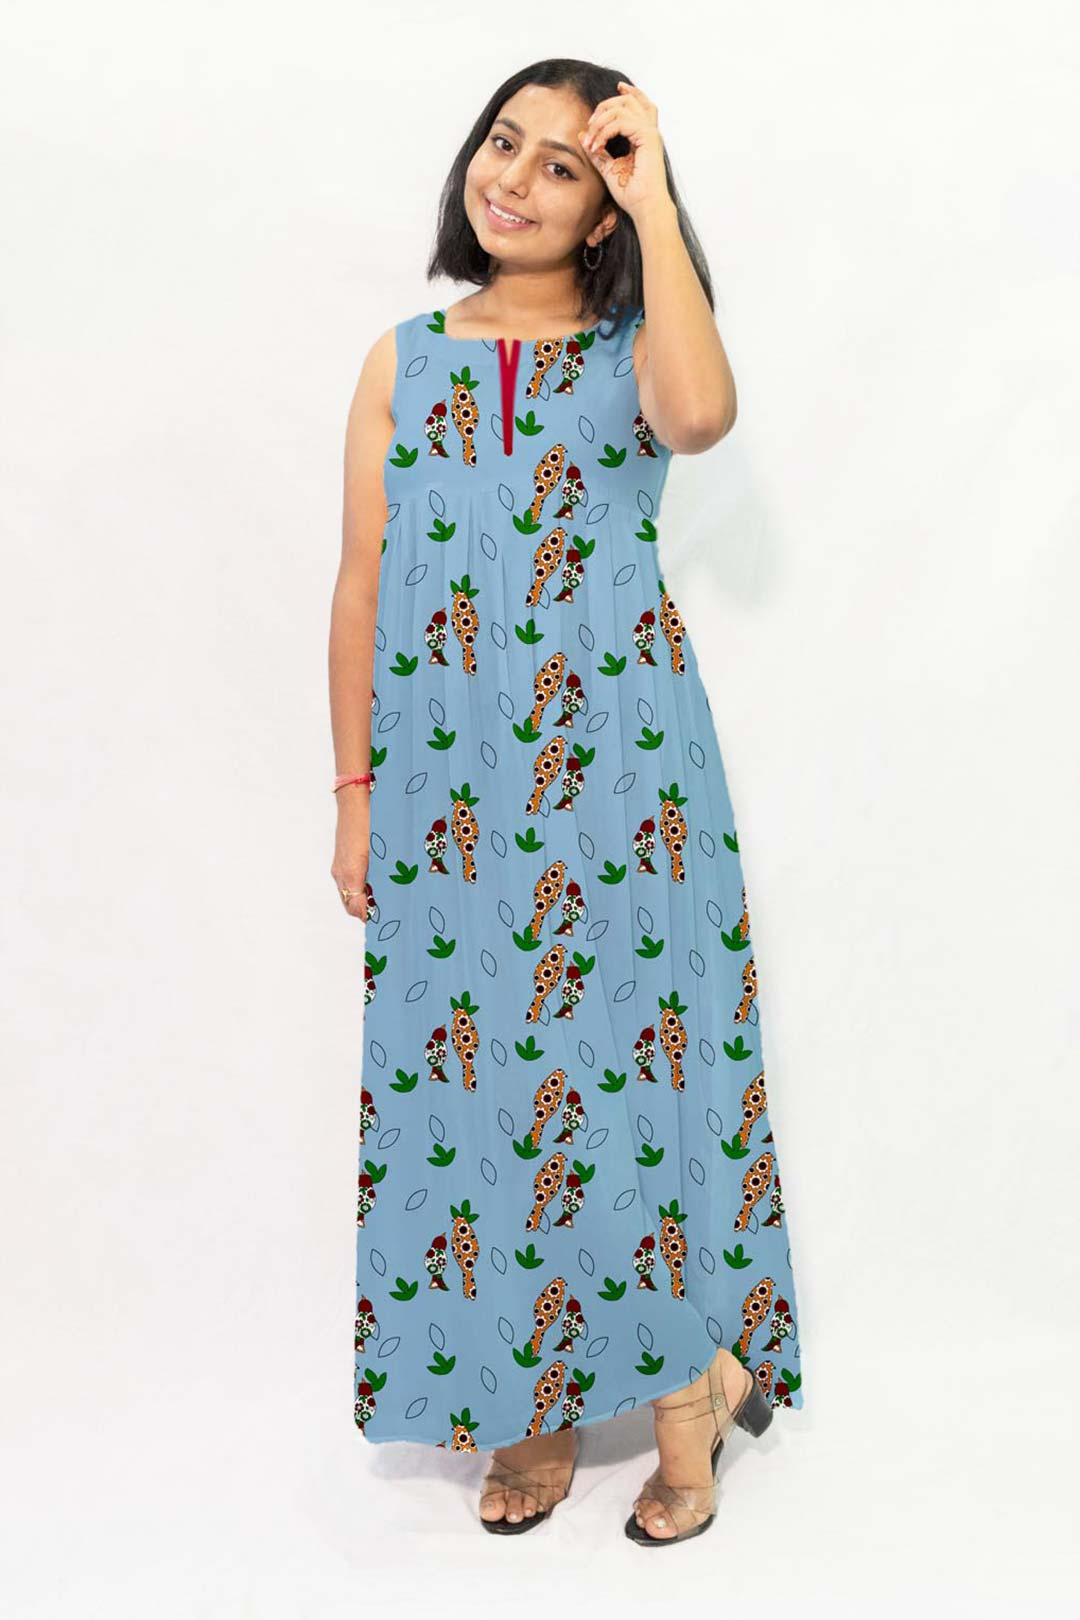 Georgette Maxi Dress – Birdies